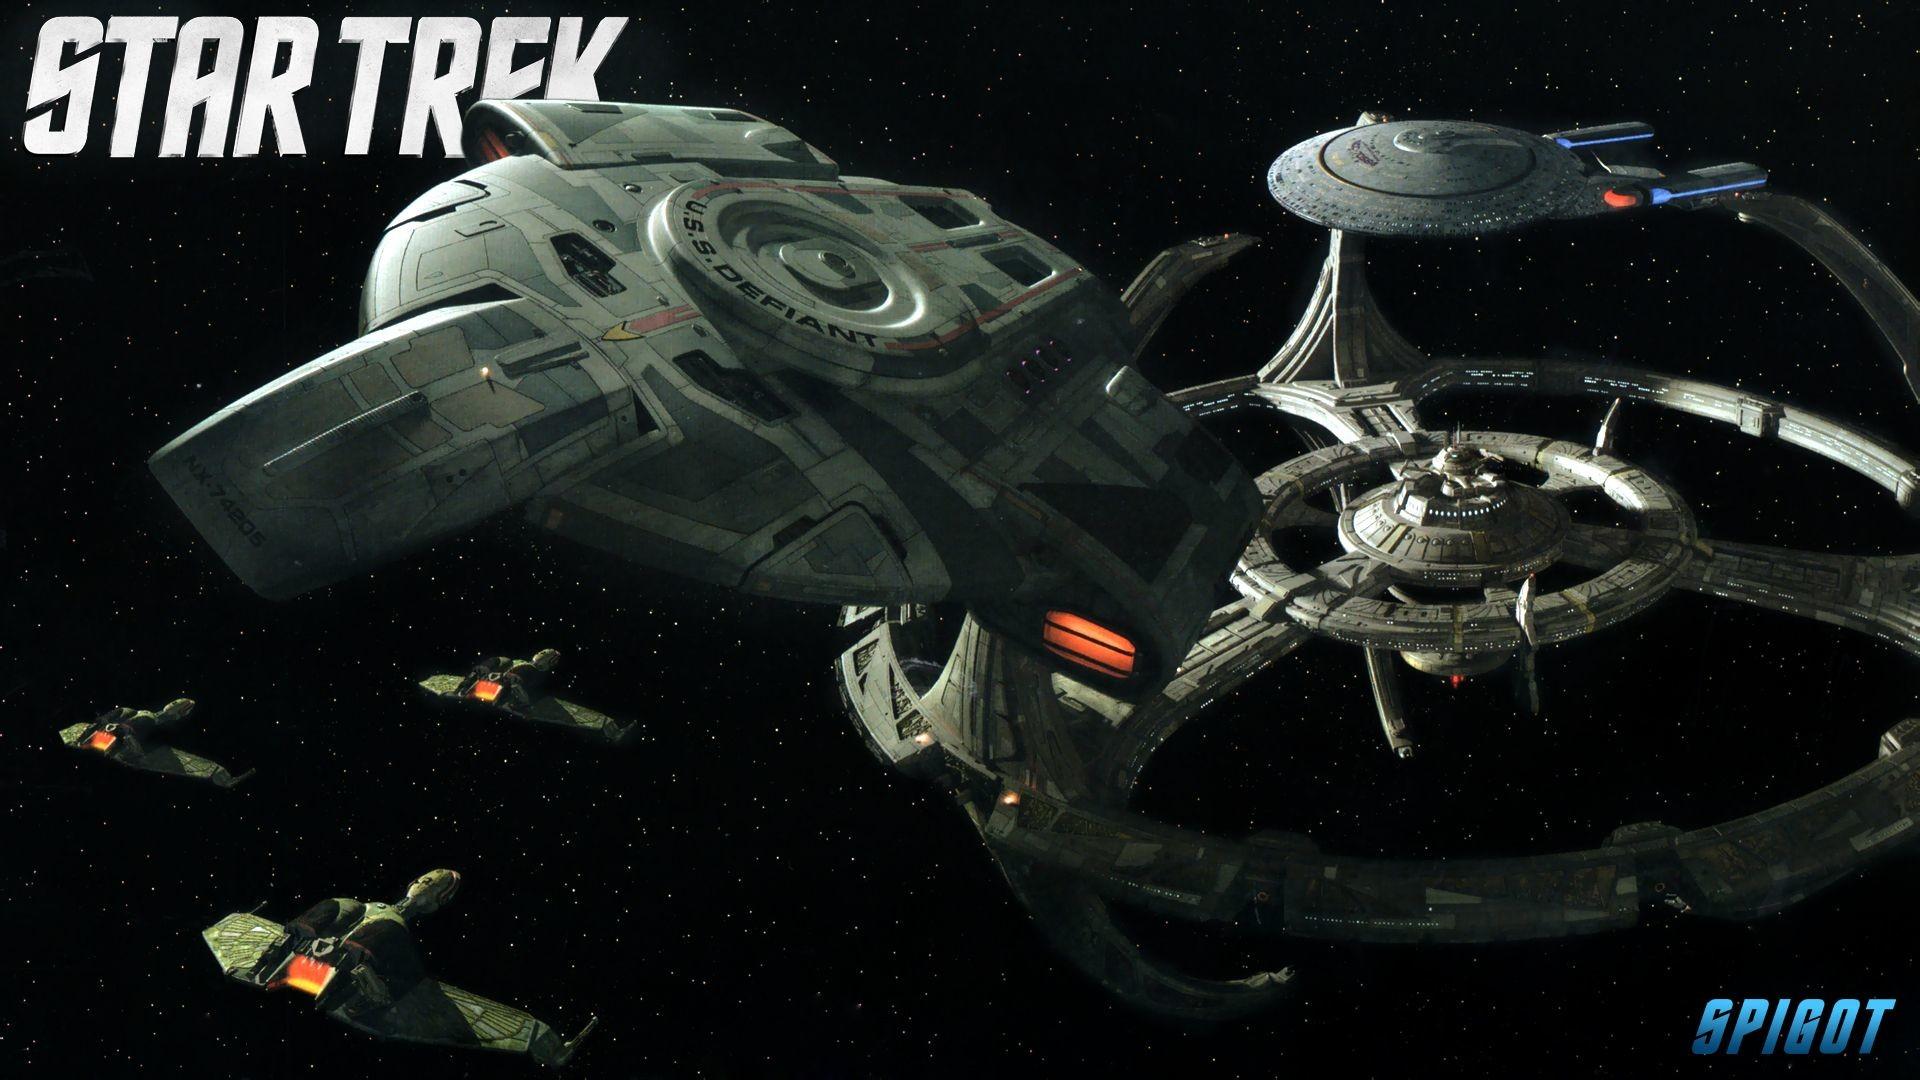 Star Trek Ship Wallpapers